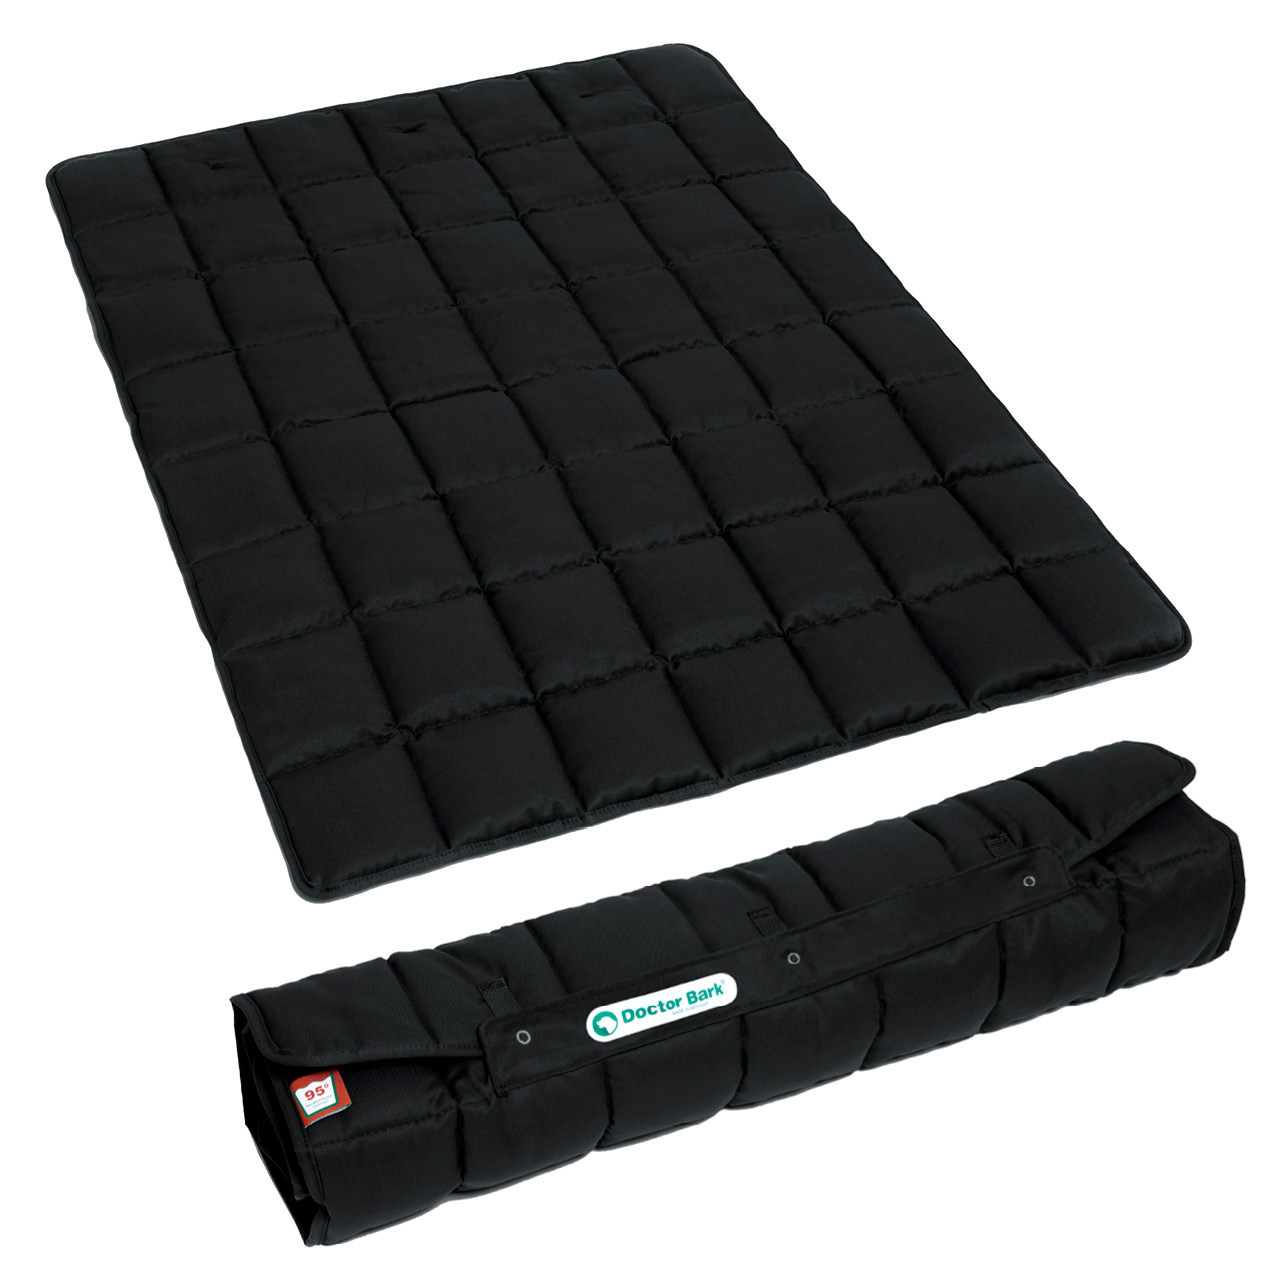 Hundedecke Portable schwarz one-size